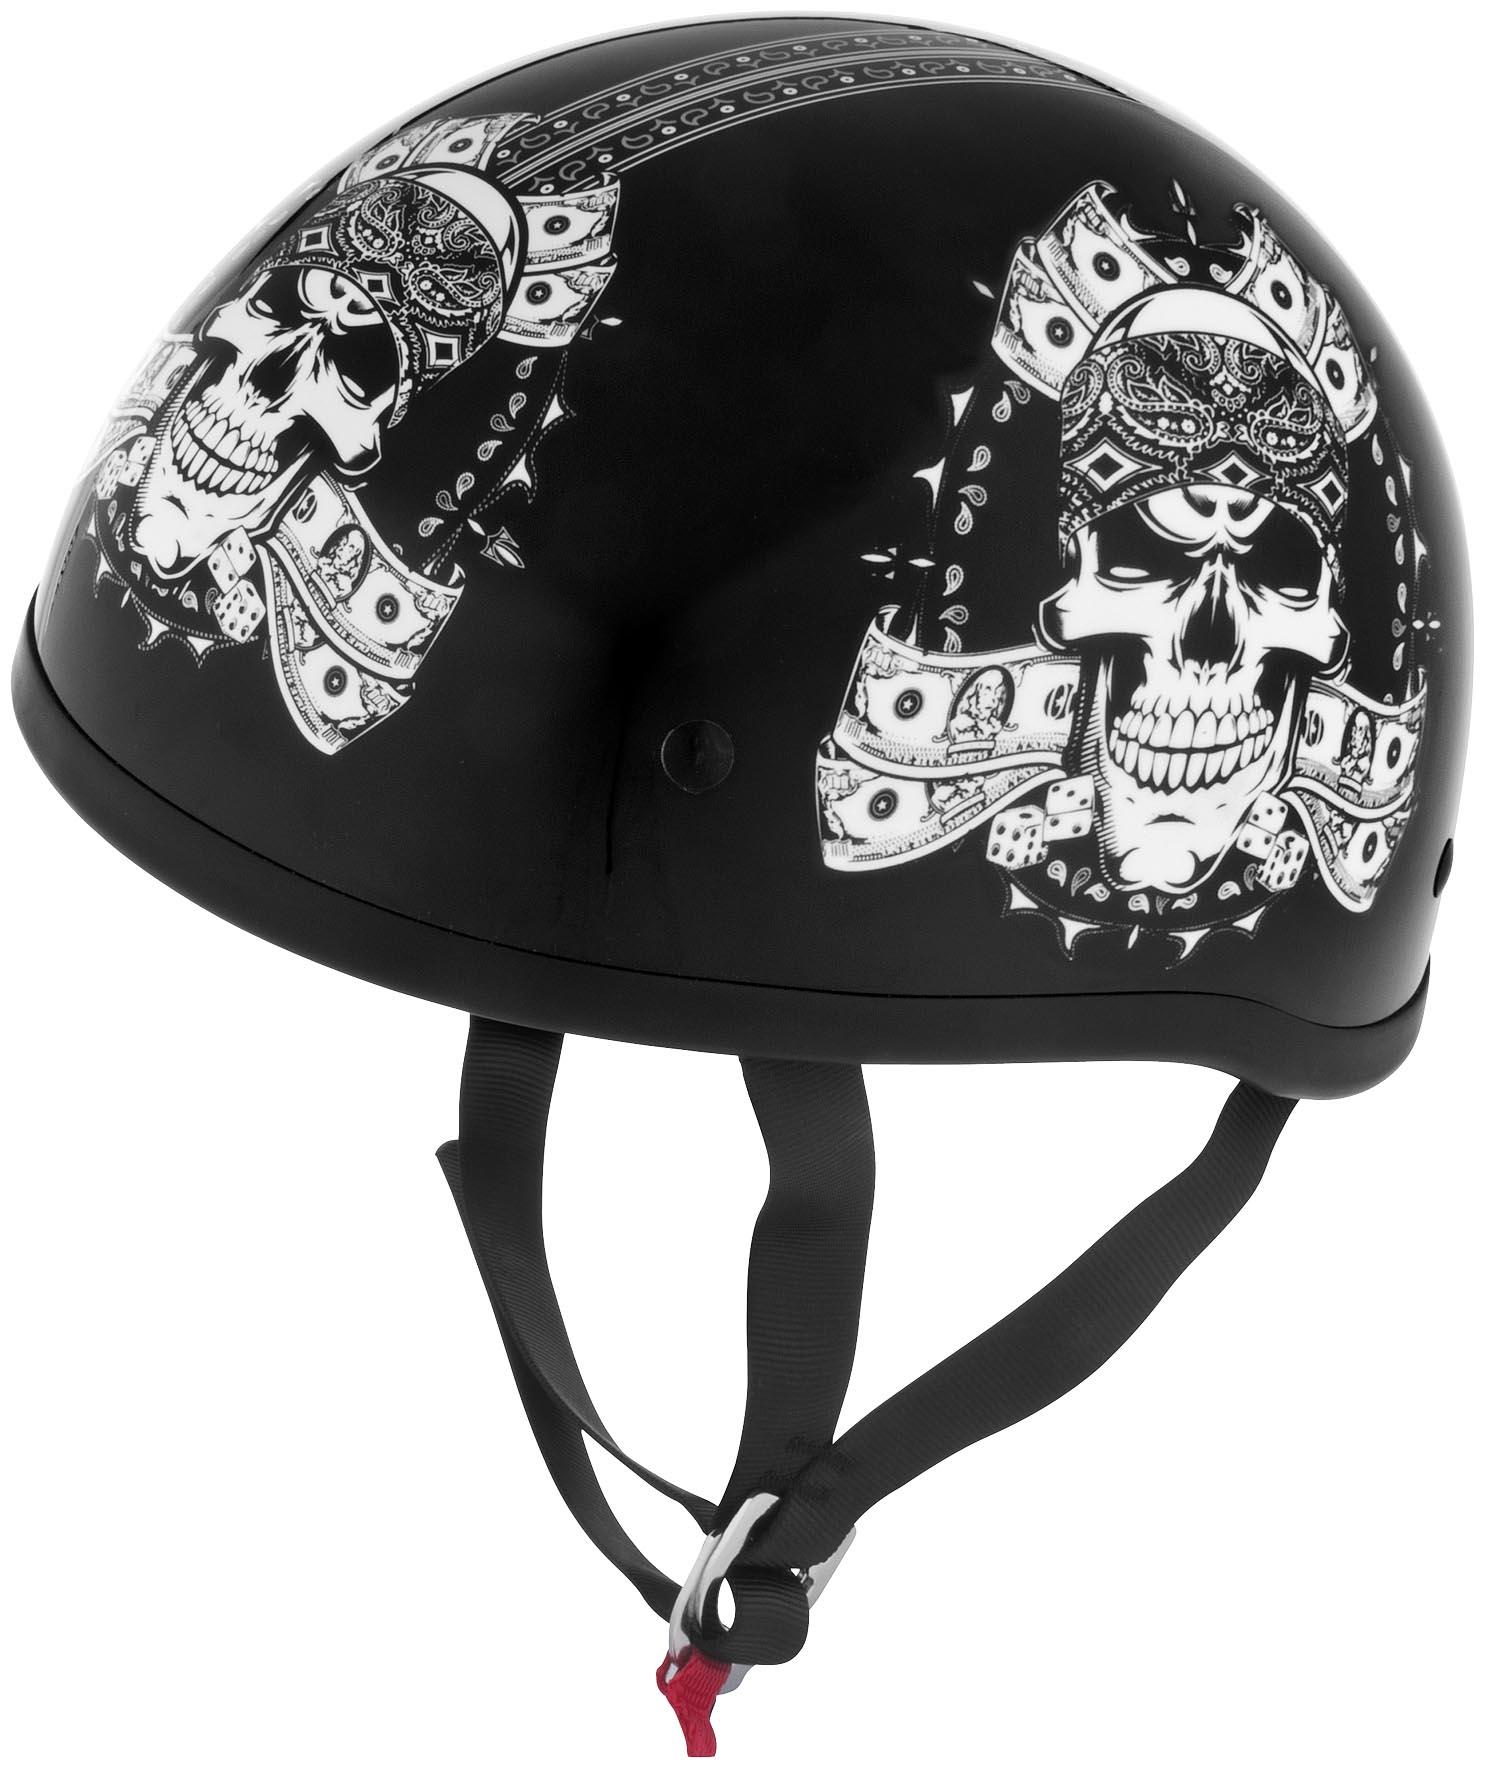 Original Thug Skull Helmet